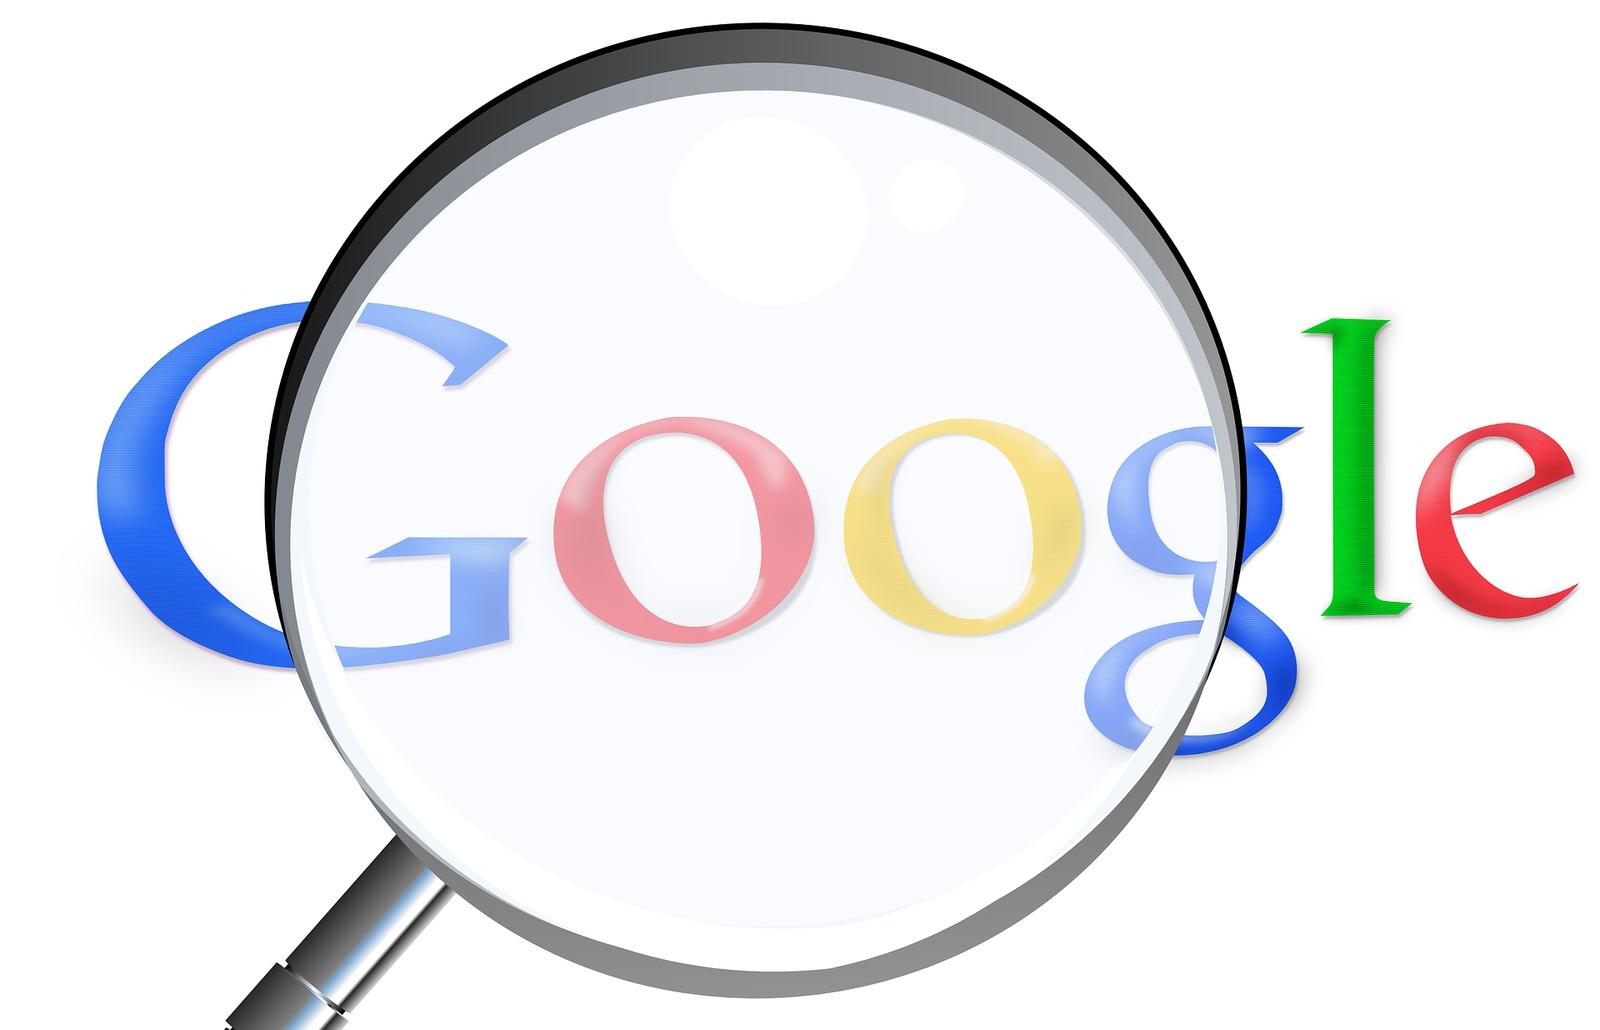 Google logo, using backlinks to improve SEO